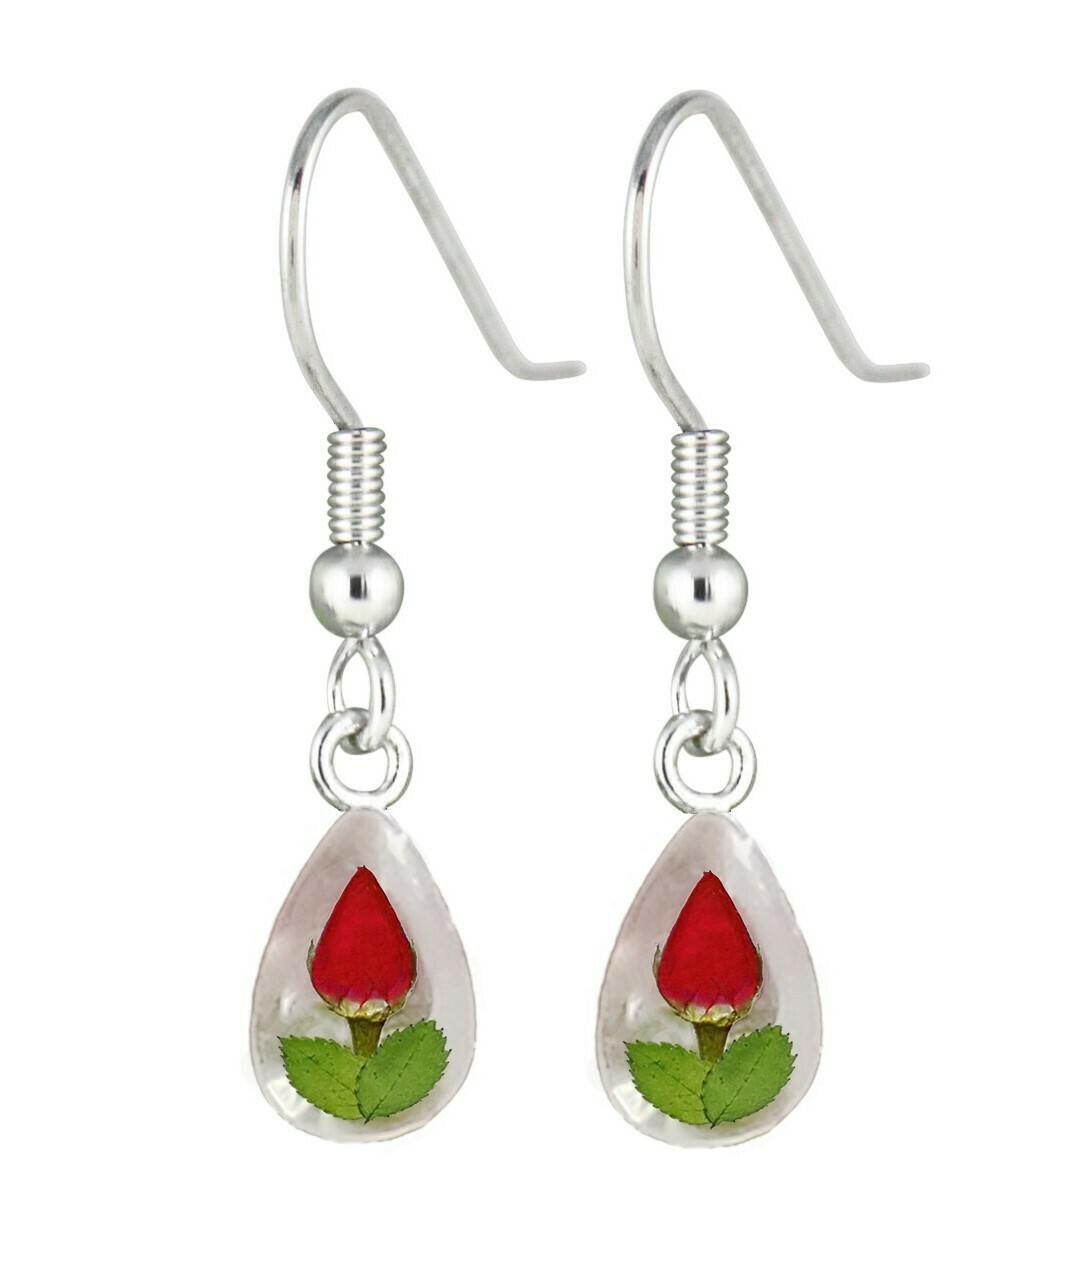 Rose, Teardrop Hanging Earrings, WWhite Banckground.